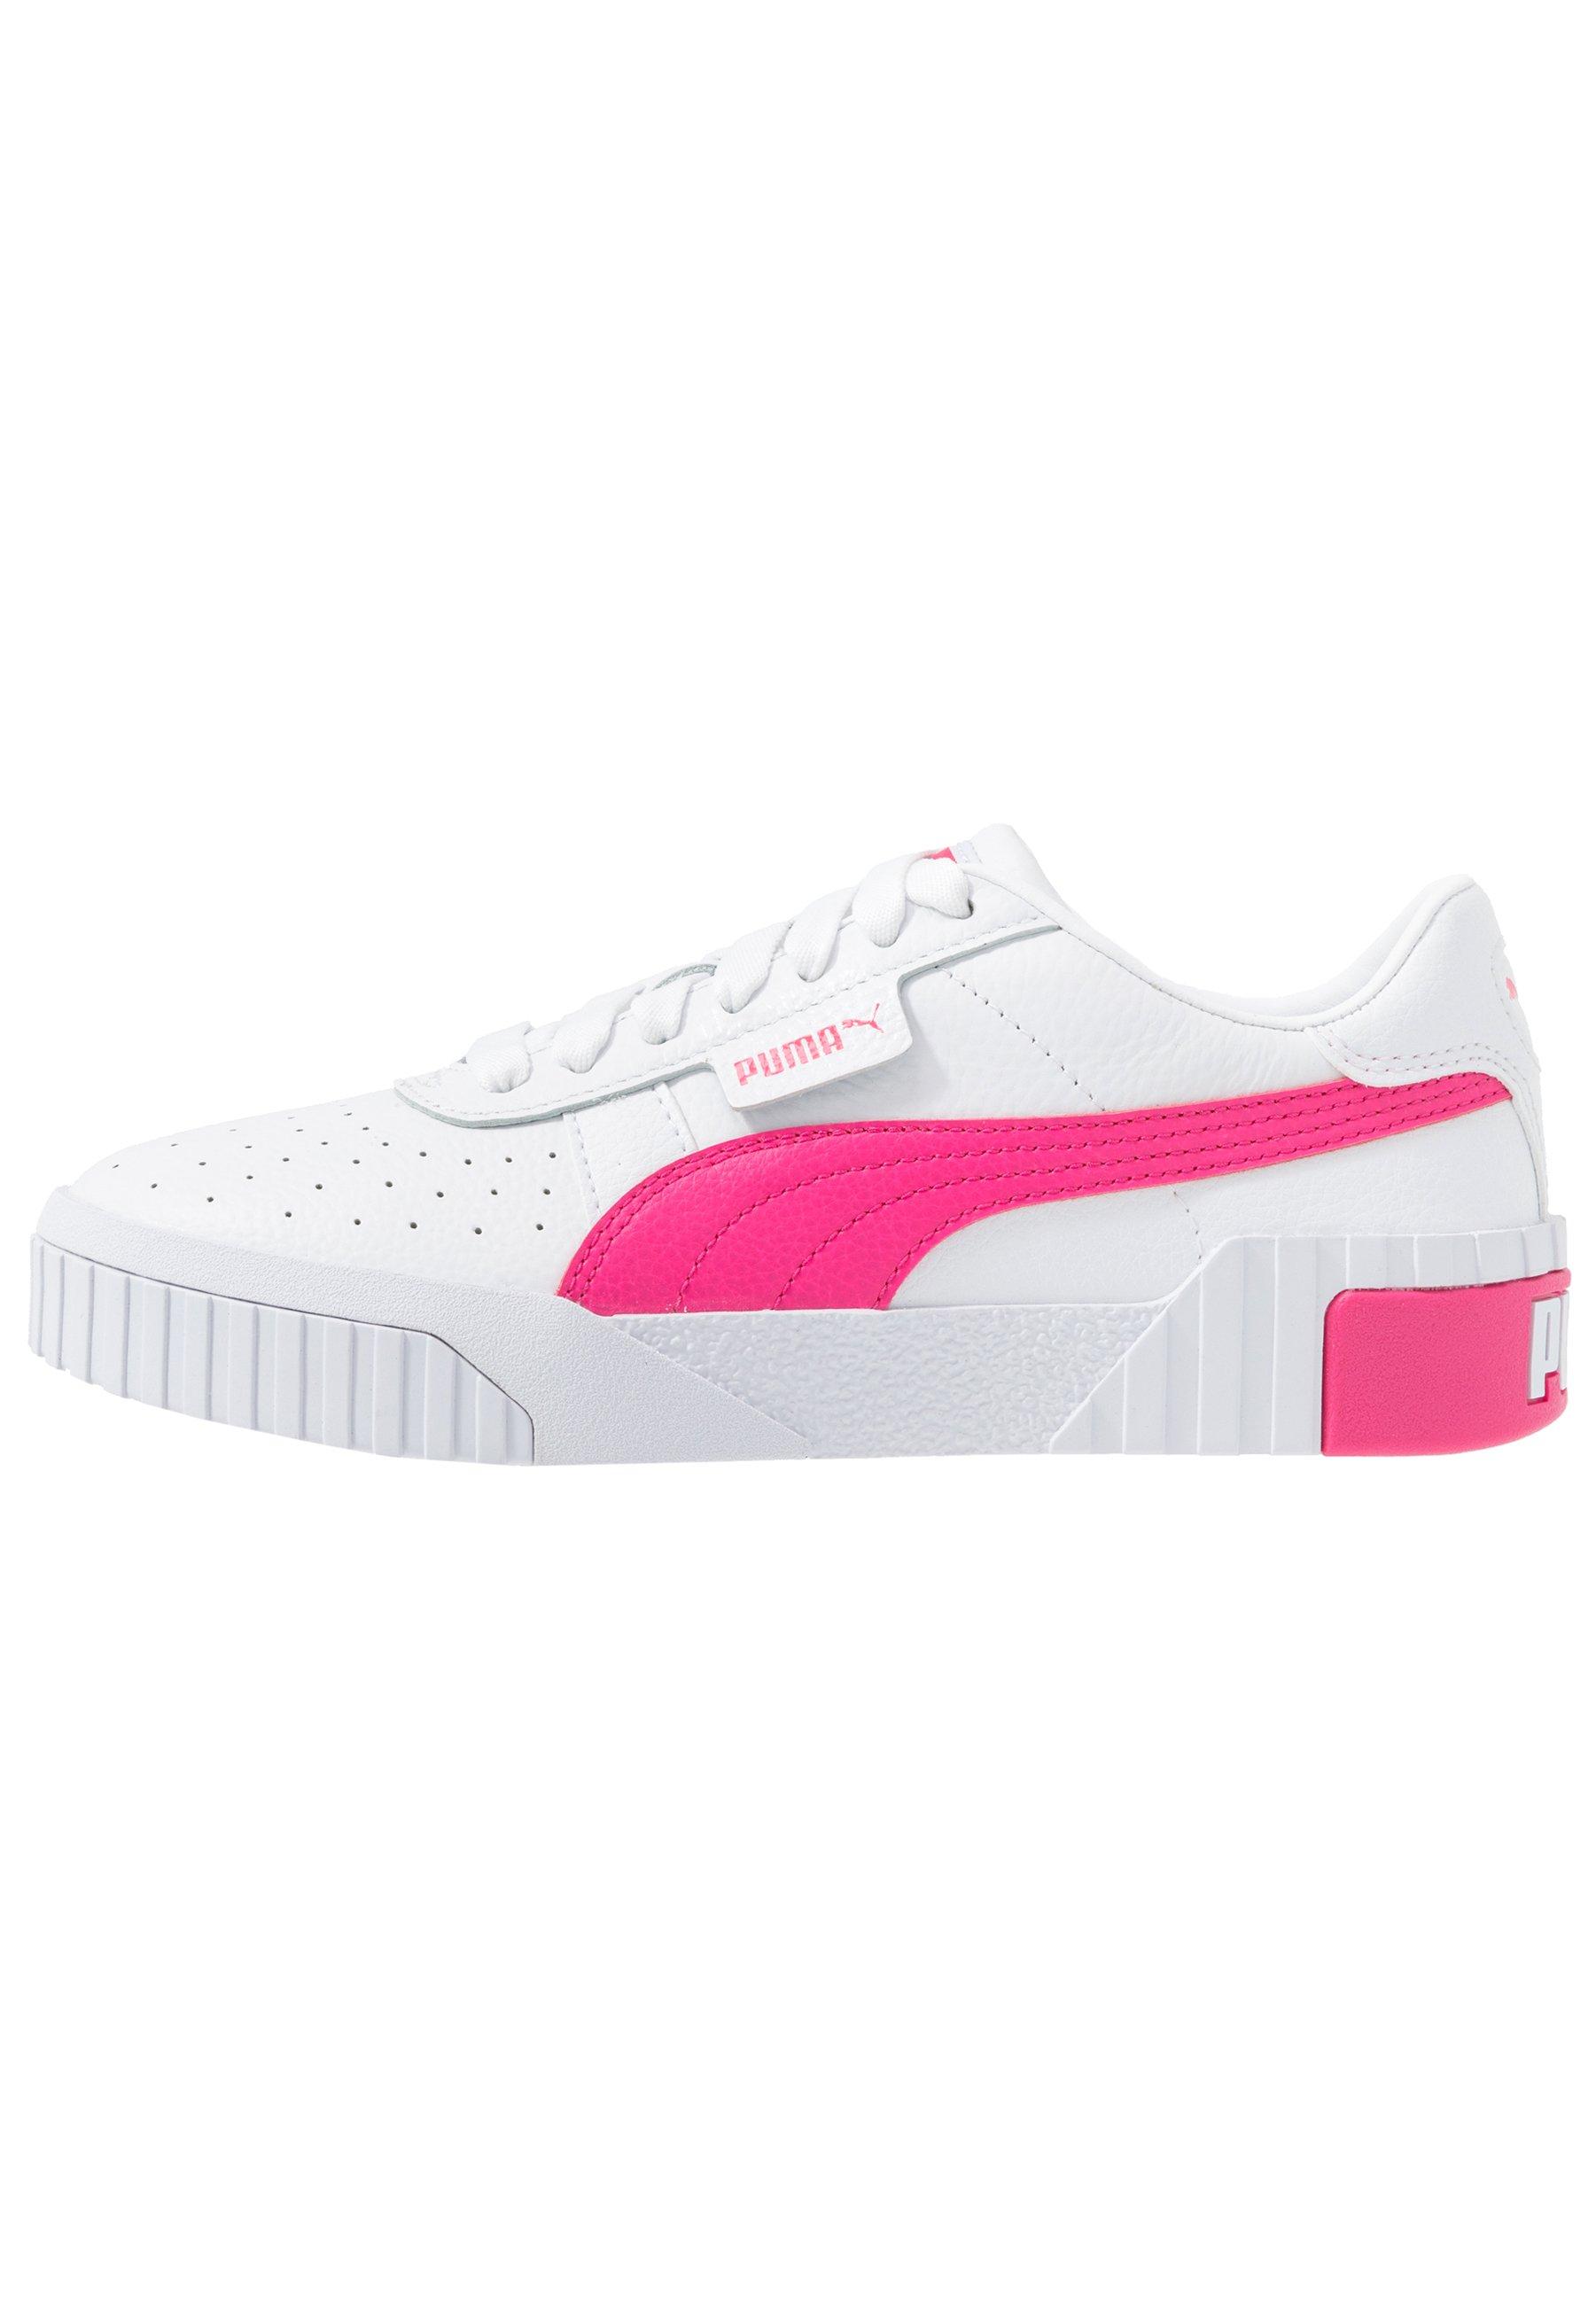 Puma CALI Sneaker low whiteglowing pink